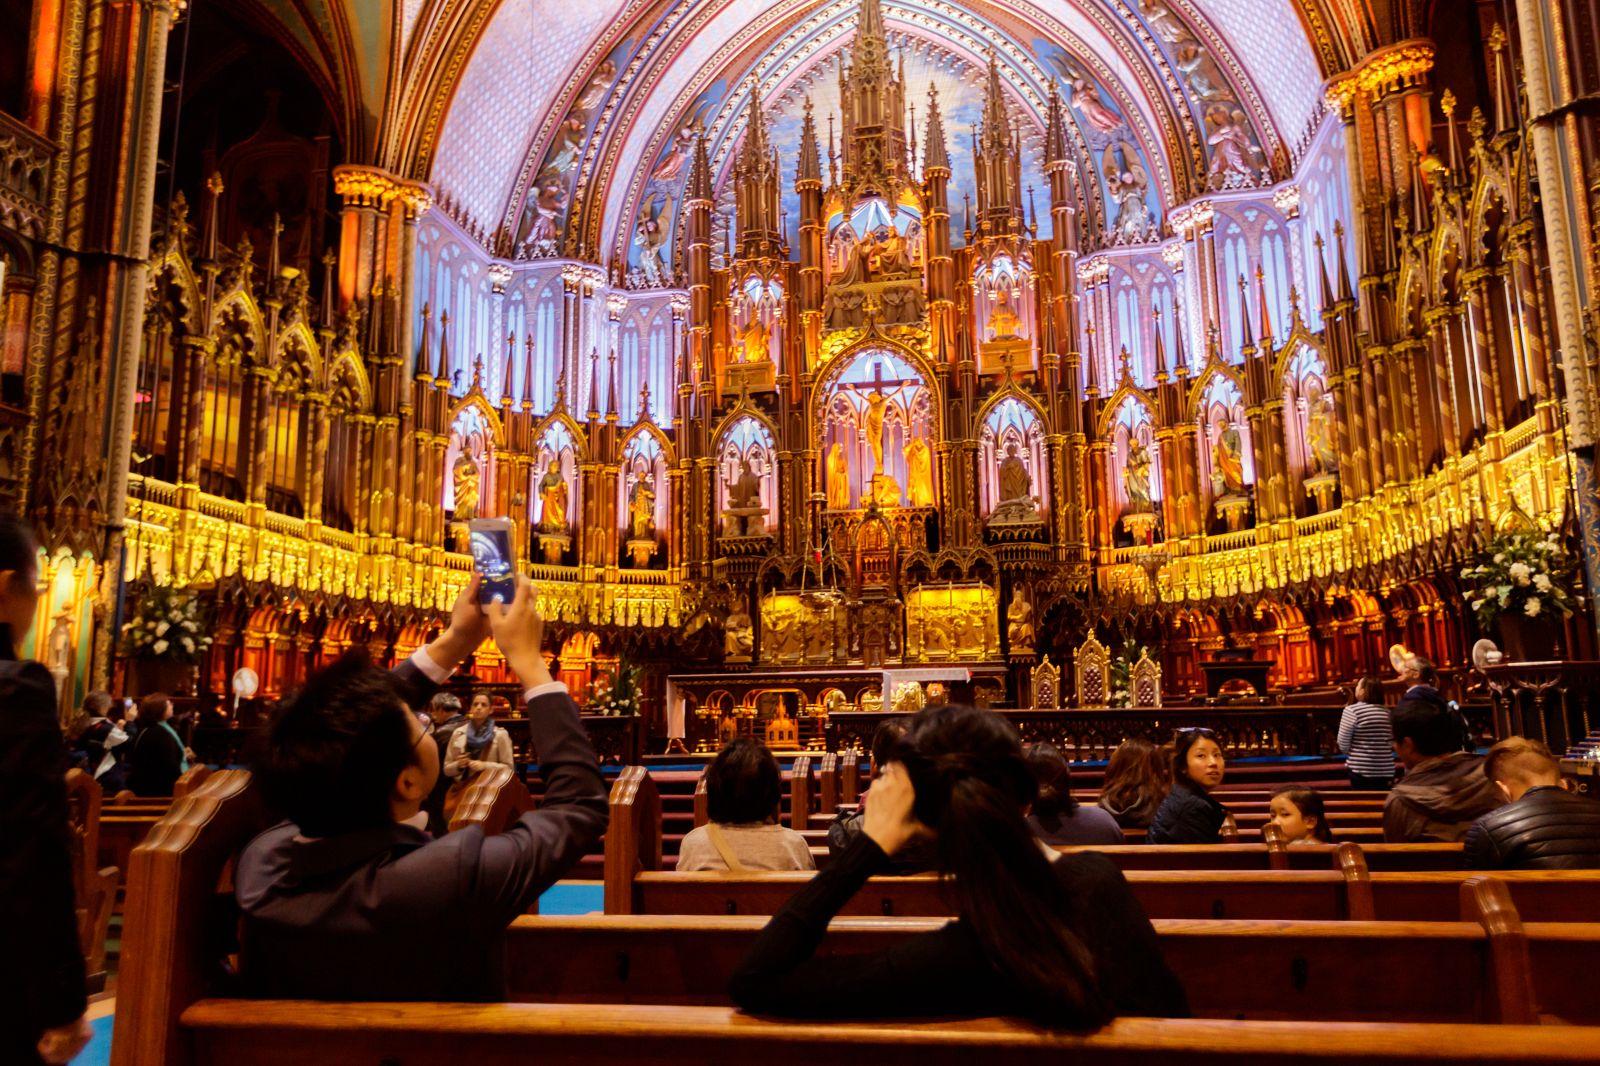 海外婚紗, 加拿大婚紗, 婚攝森森, 蒙特利爾婚紗, montreal wedding, 蒙特利爾婚紗寫真, montreal engagement photos